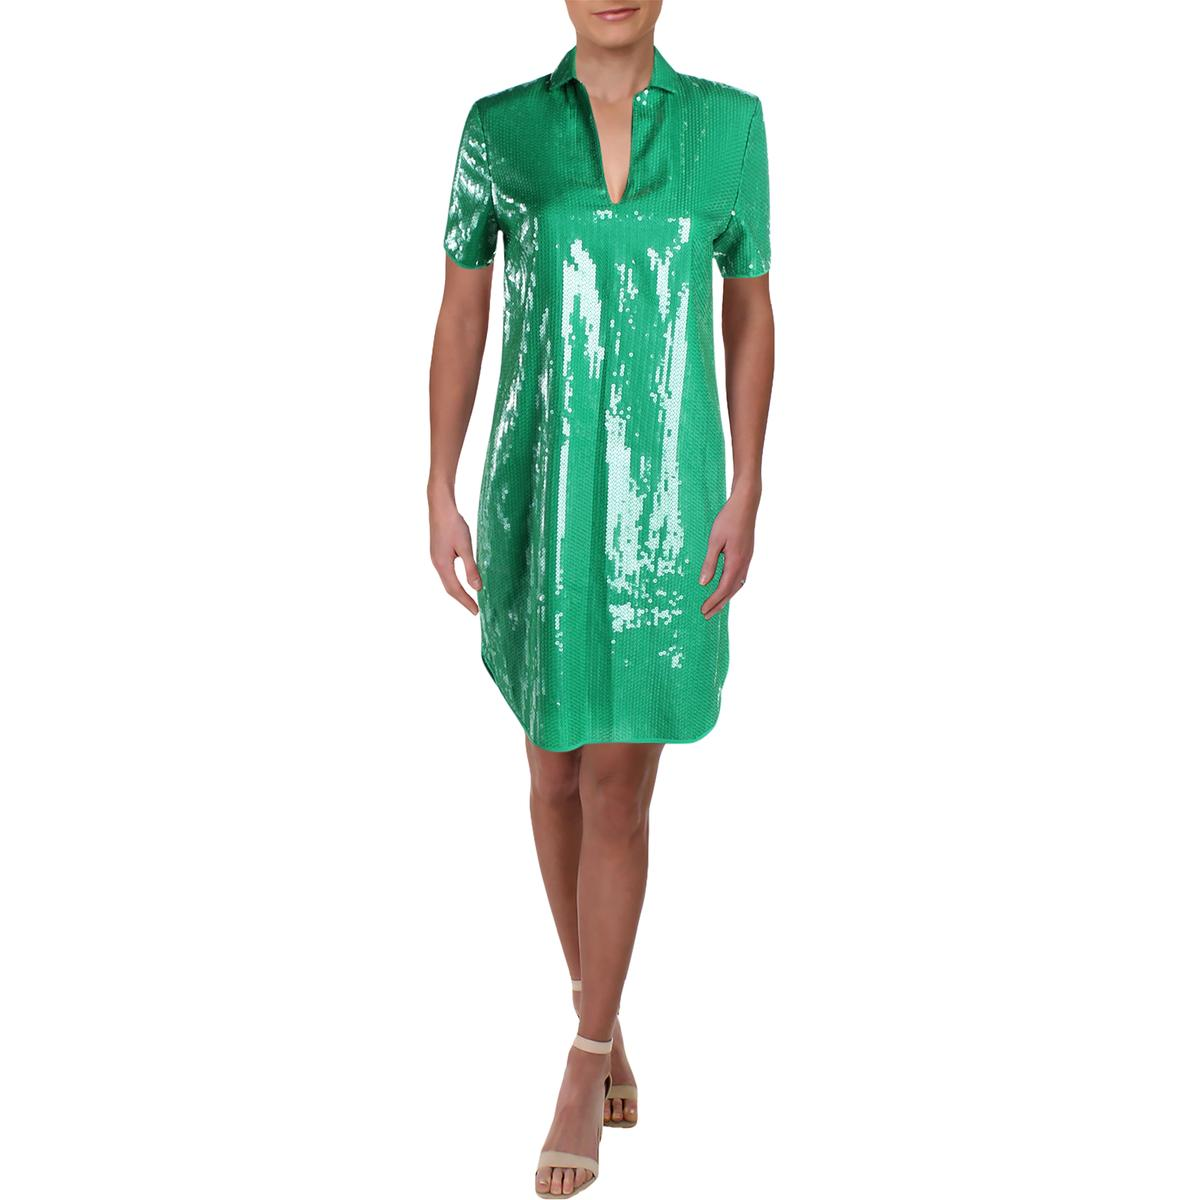 Halston Heritage Womens Sleeveless Halter Party Cocktail Dress BHFO 9853